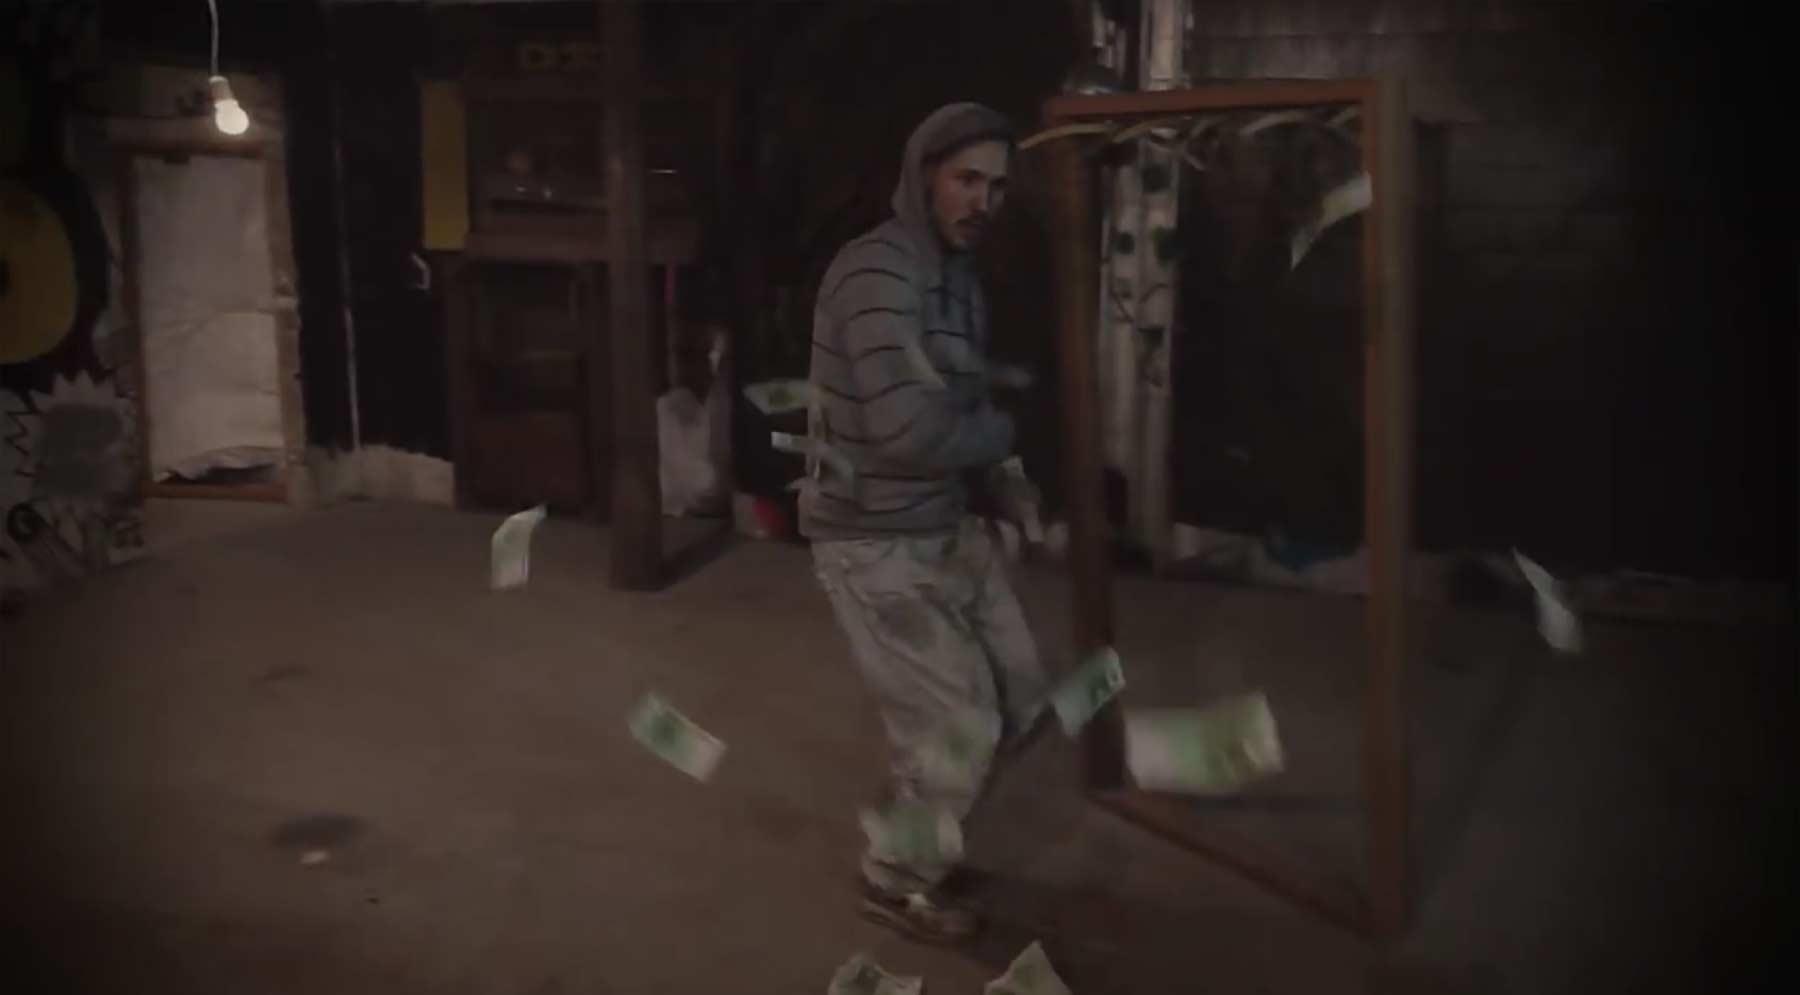 Rückwärts in einem Take gedrehtes Musikvideo pitvalid-pitrock